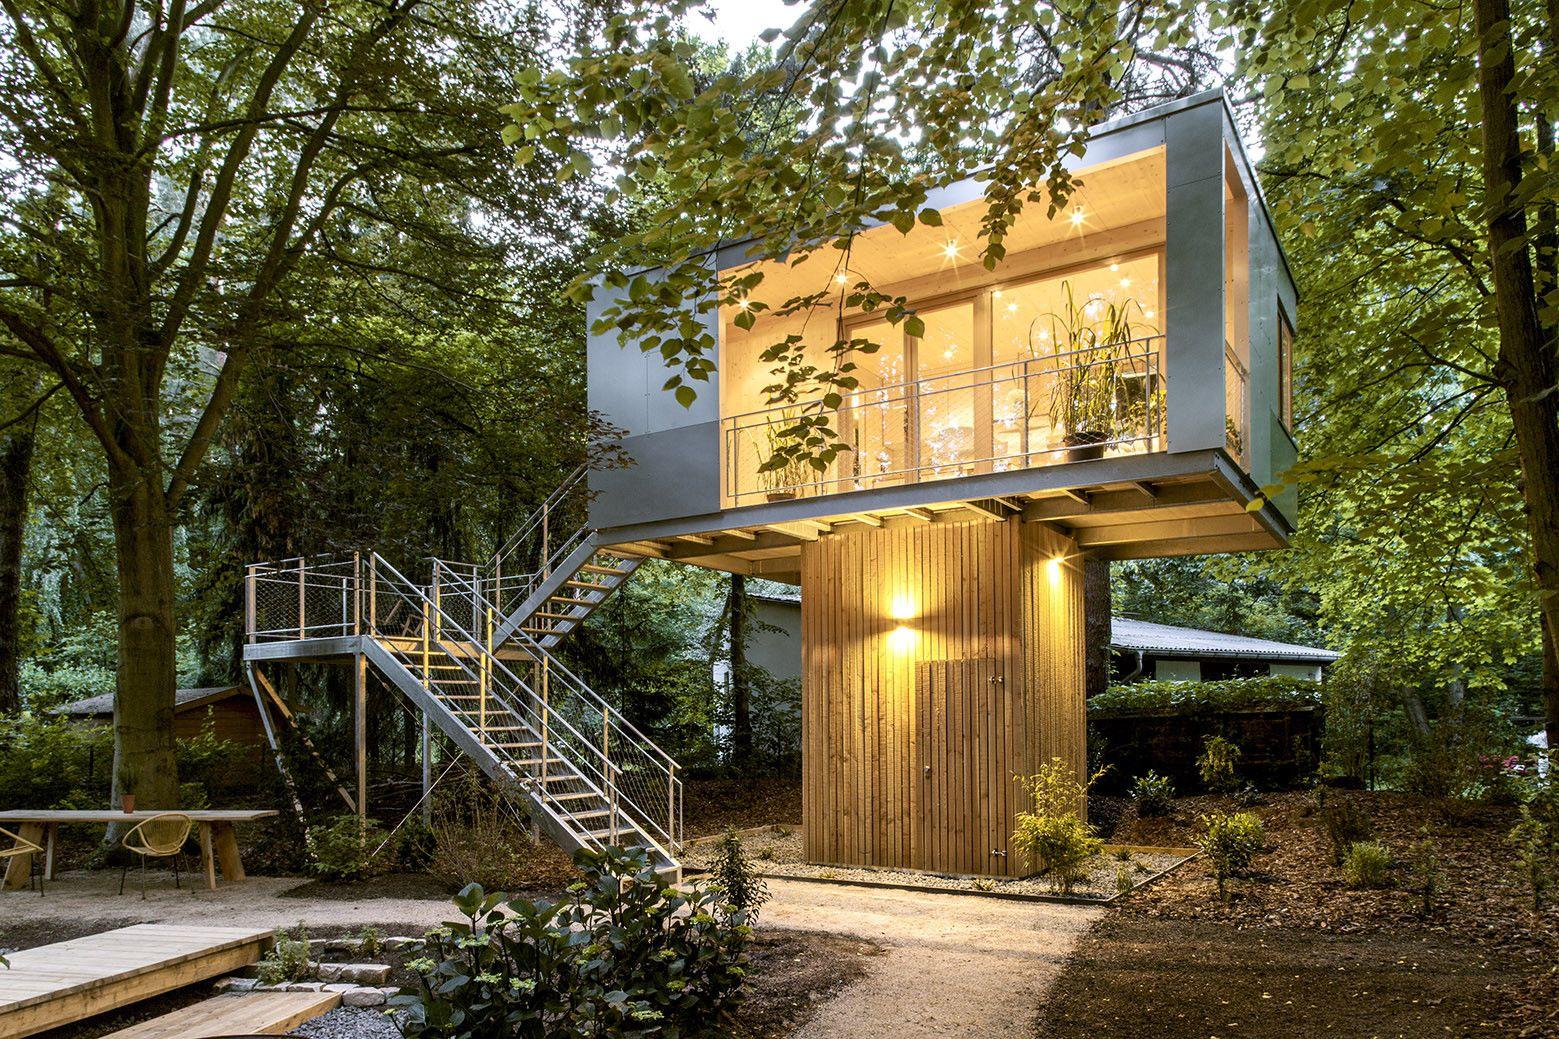 Modern Tree Houses Gallery Of Urban Treehouse Baumraum 1 Treehouse Tree Houses